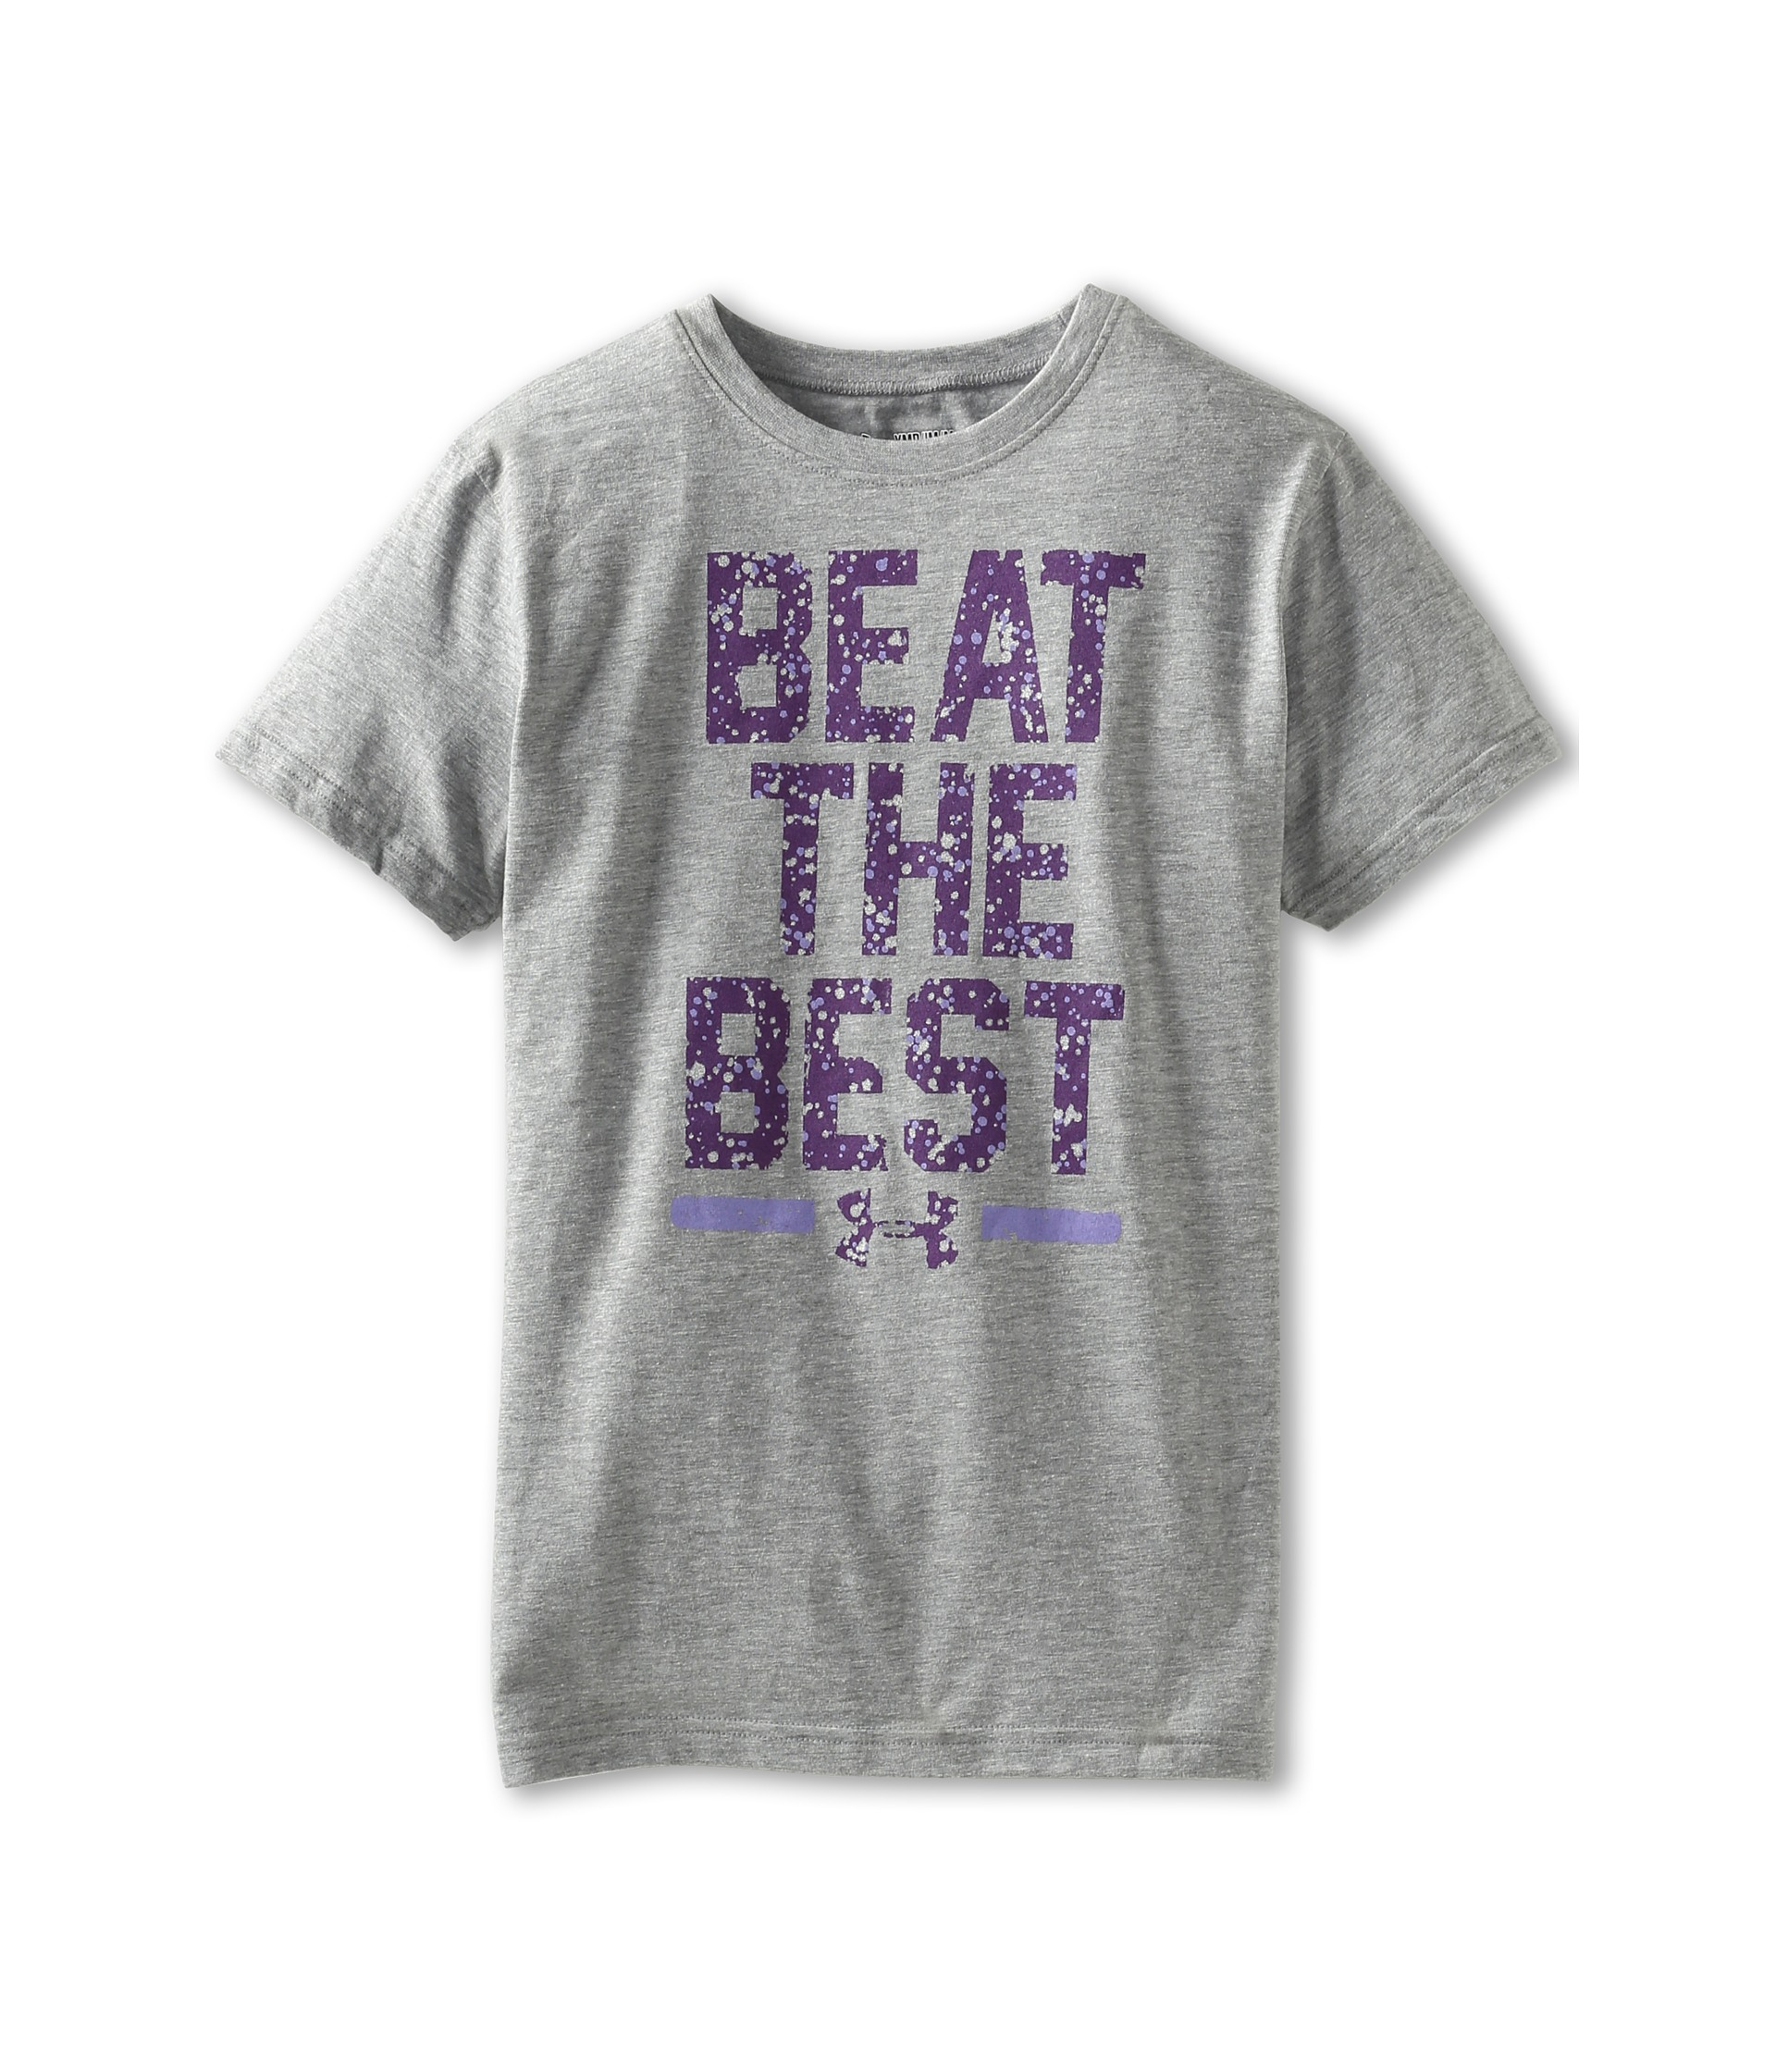 Under armour kids ua beat the best camo graphic t shirt for Under armour shirts for kids